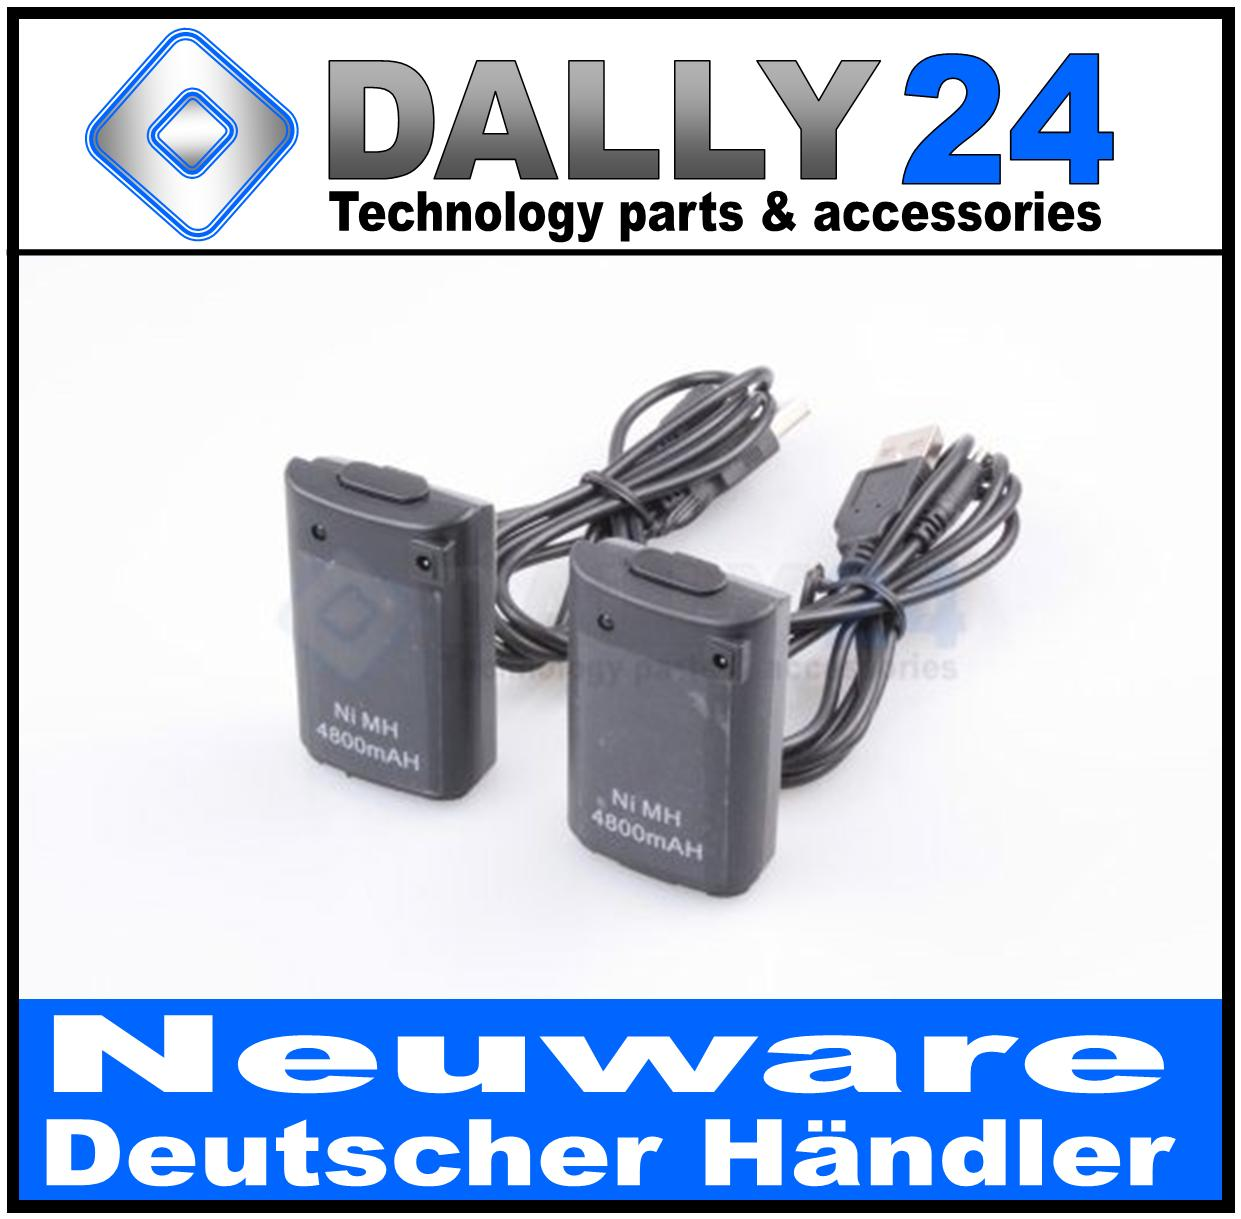 2x-Controller-Akku-Pack-fuer-Xbox-360-4800mAh-mit-Ladekabel-schwarz